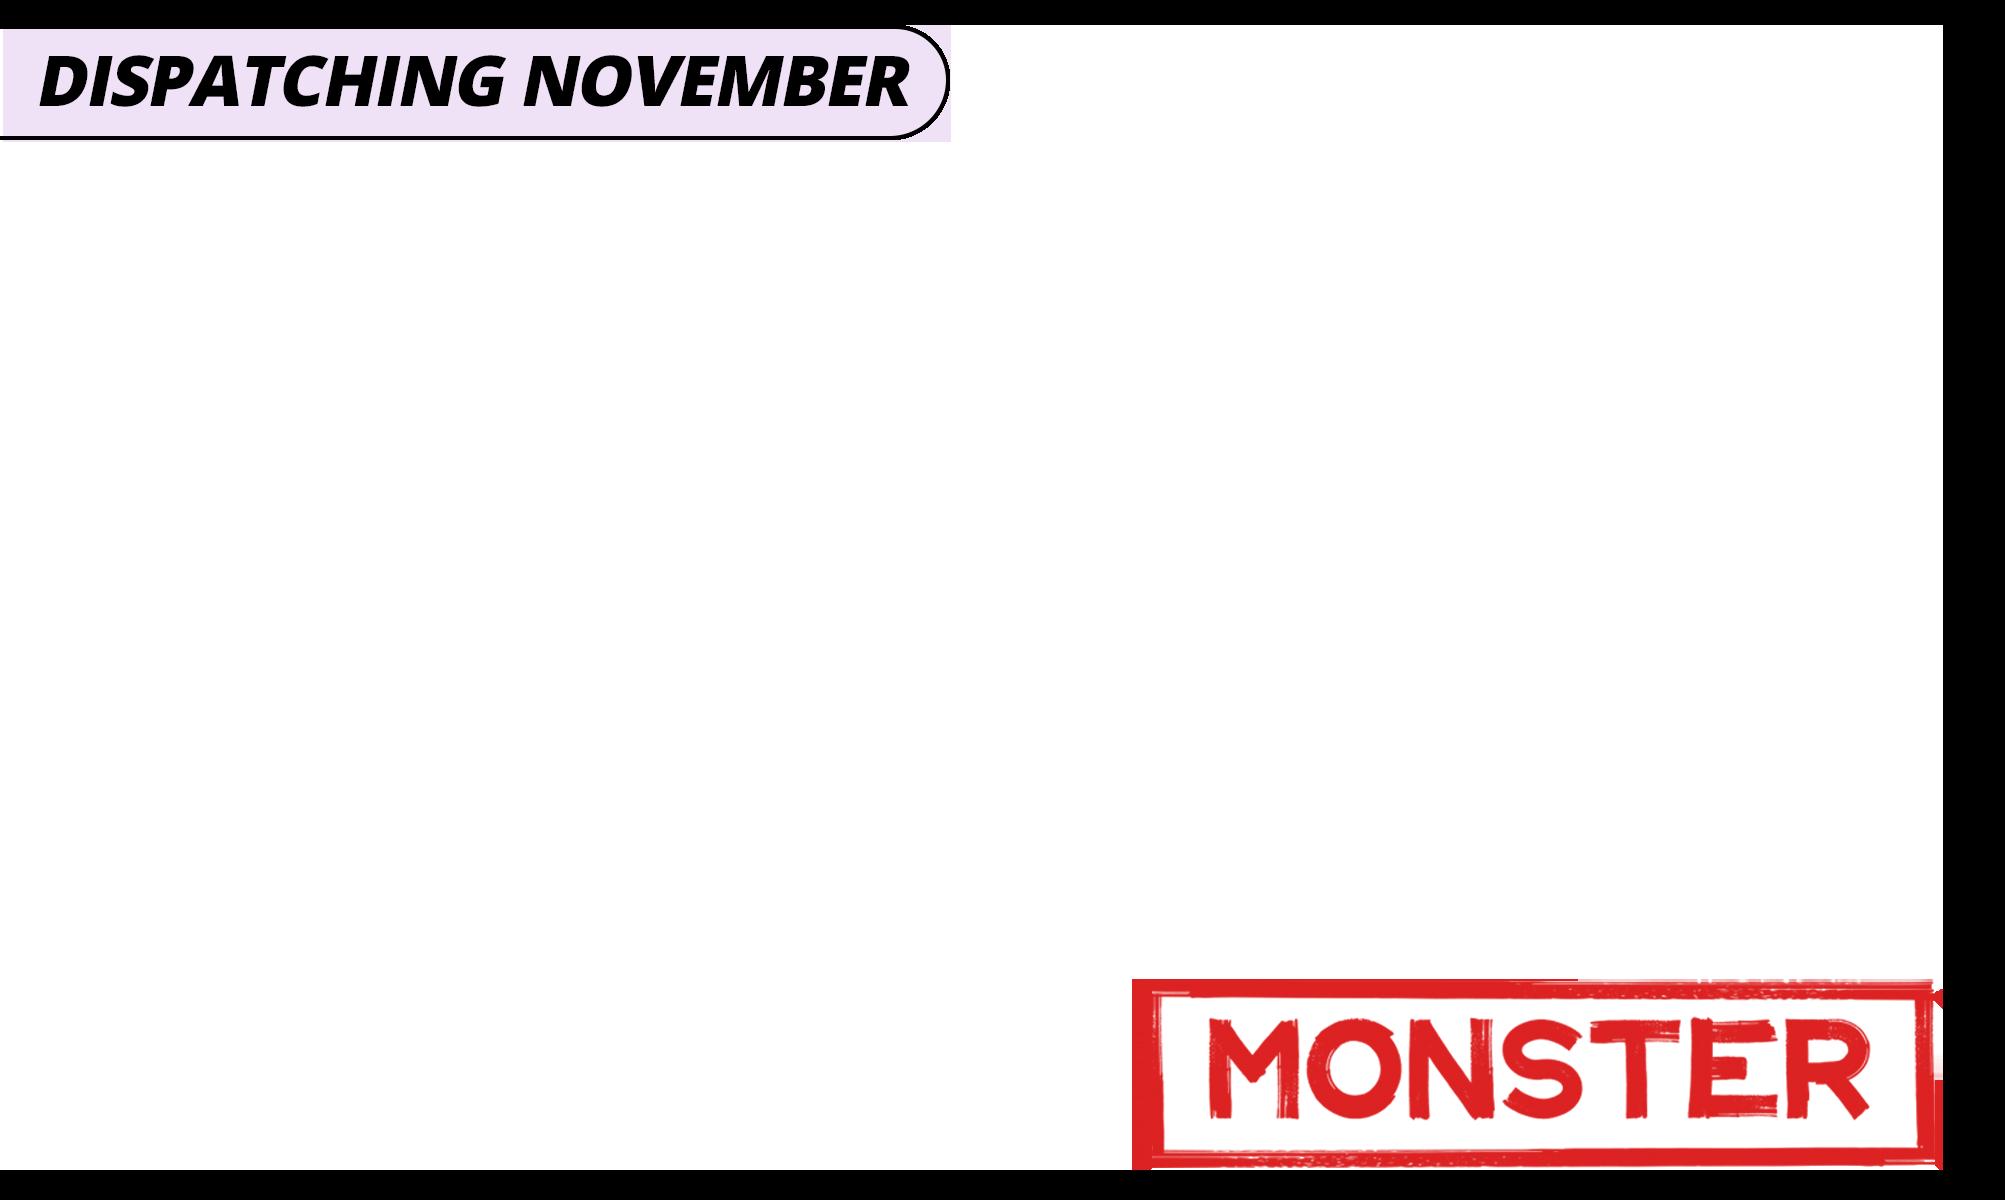 Dispatching november   monster   purple